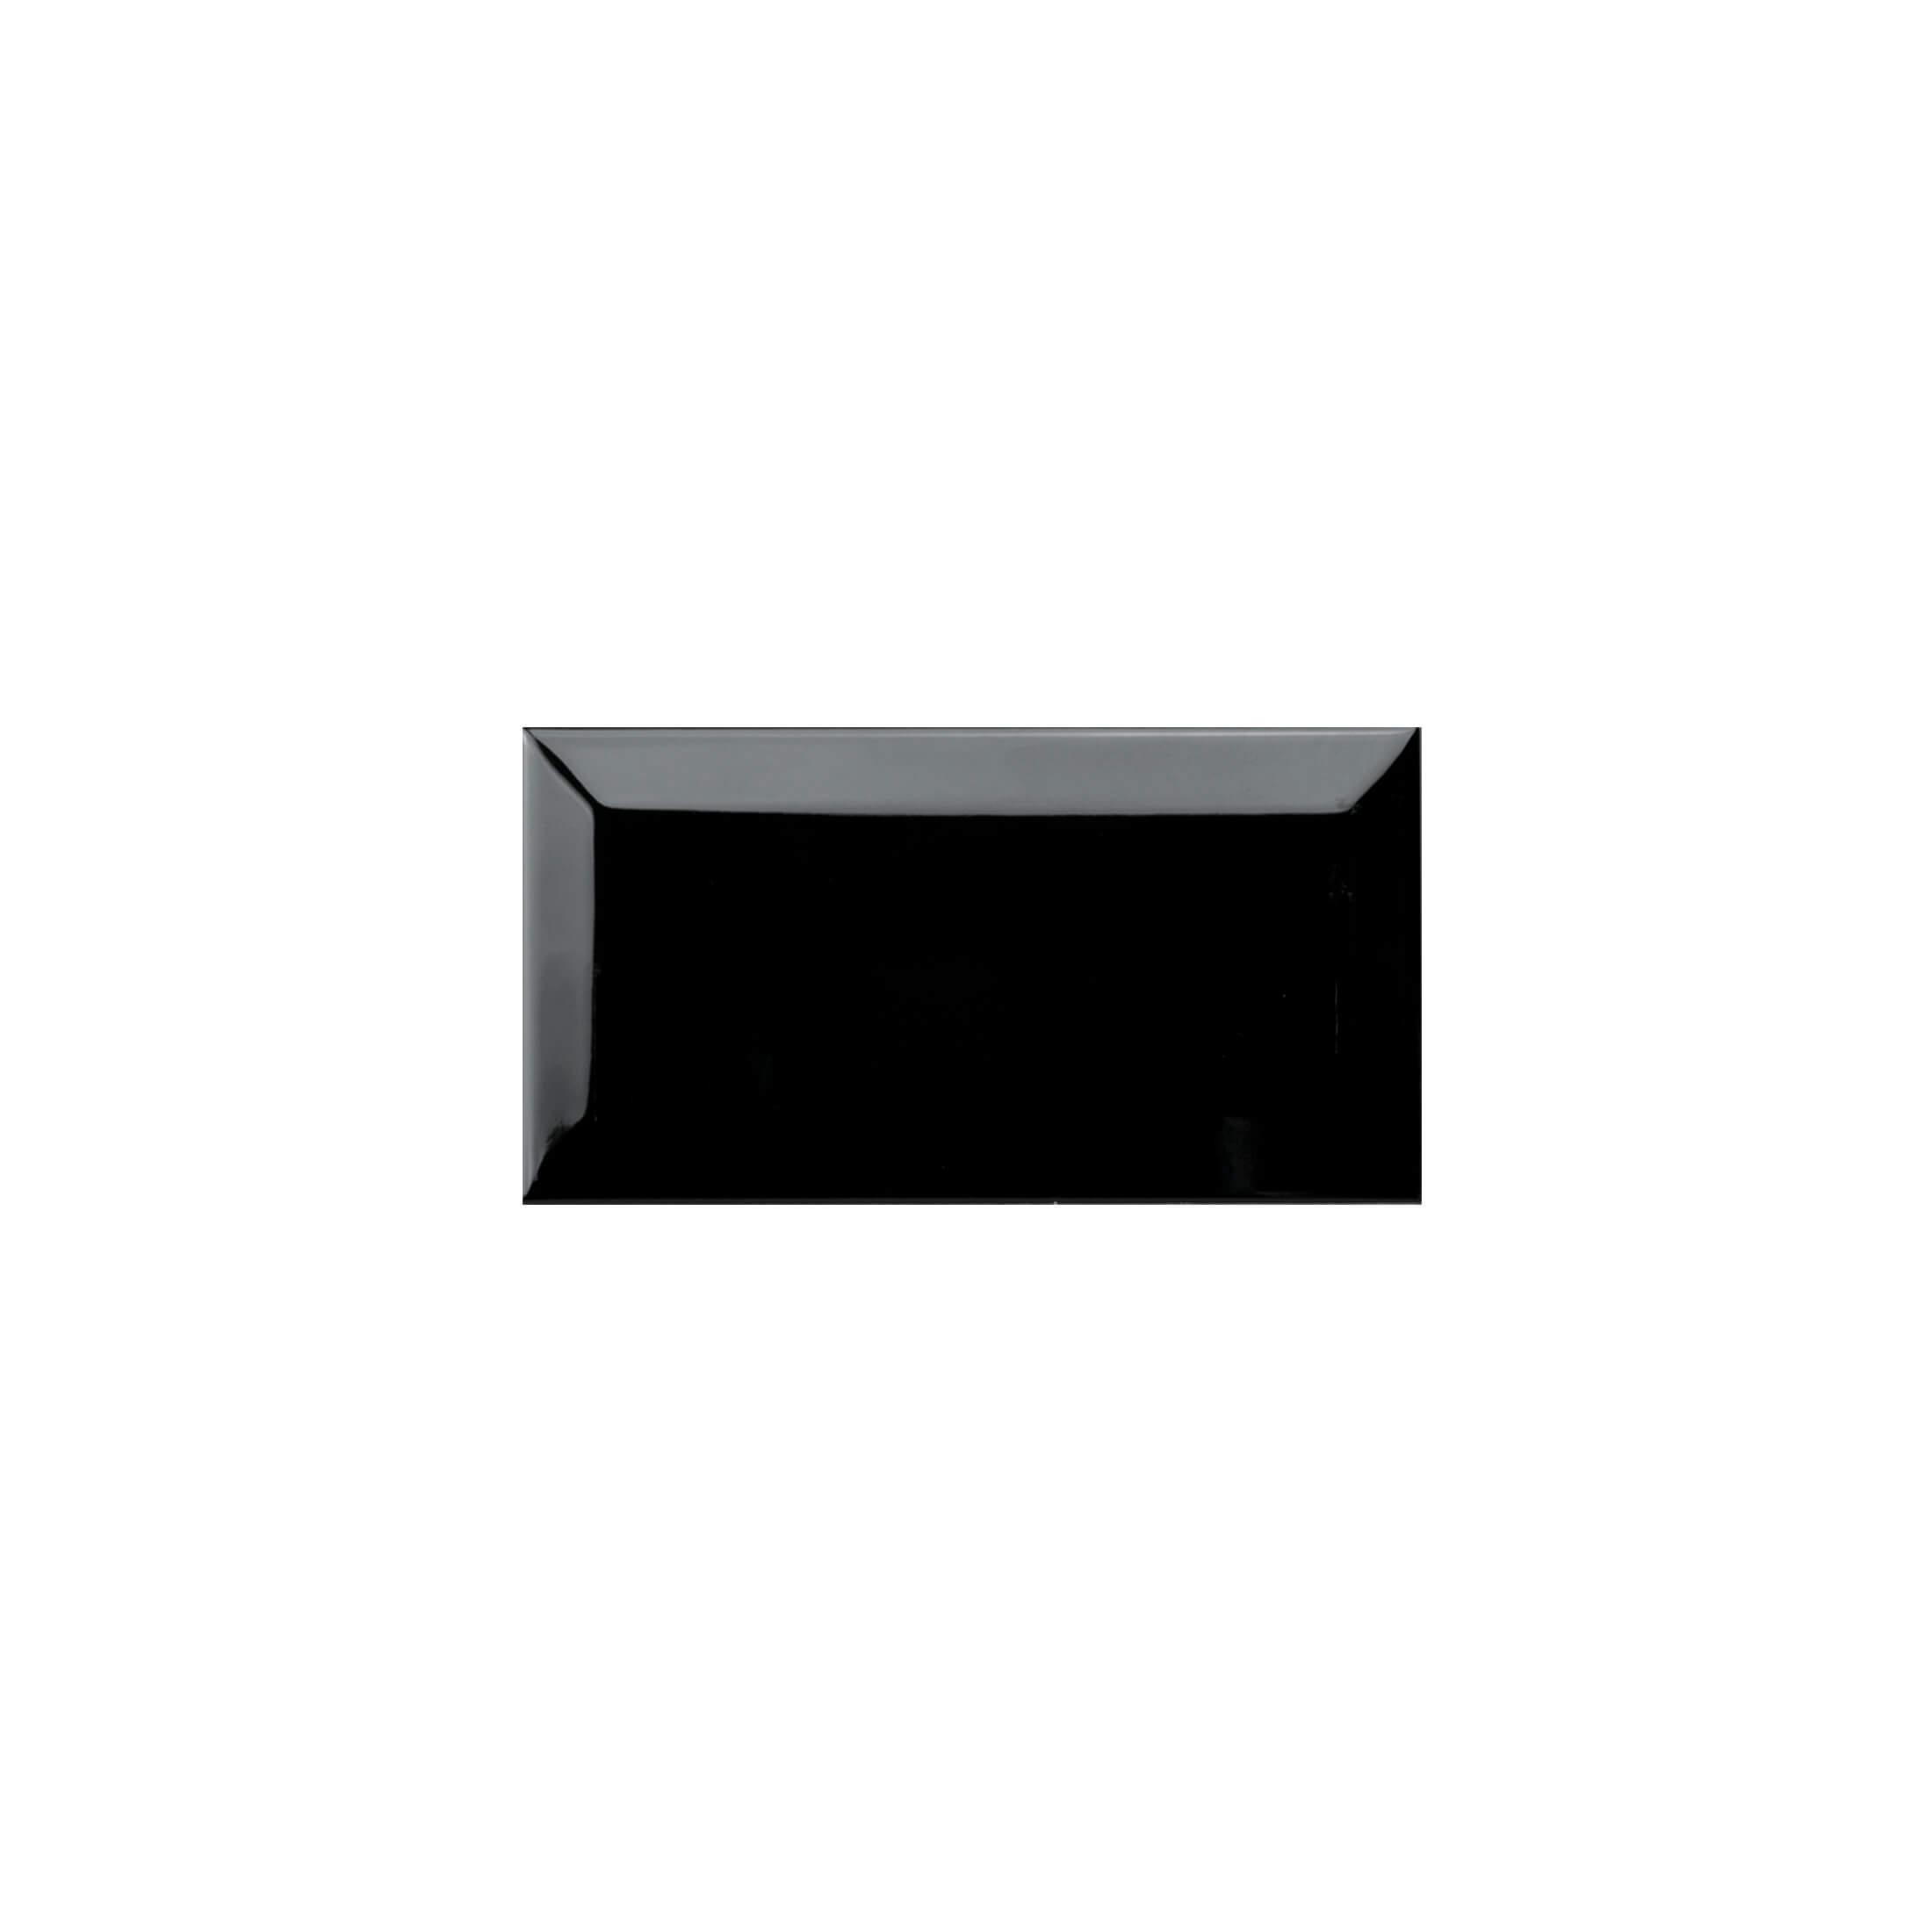 ADNE2042 - BISELADO PB - 7.5 cm X 15 cm